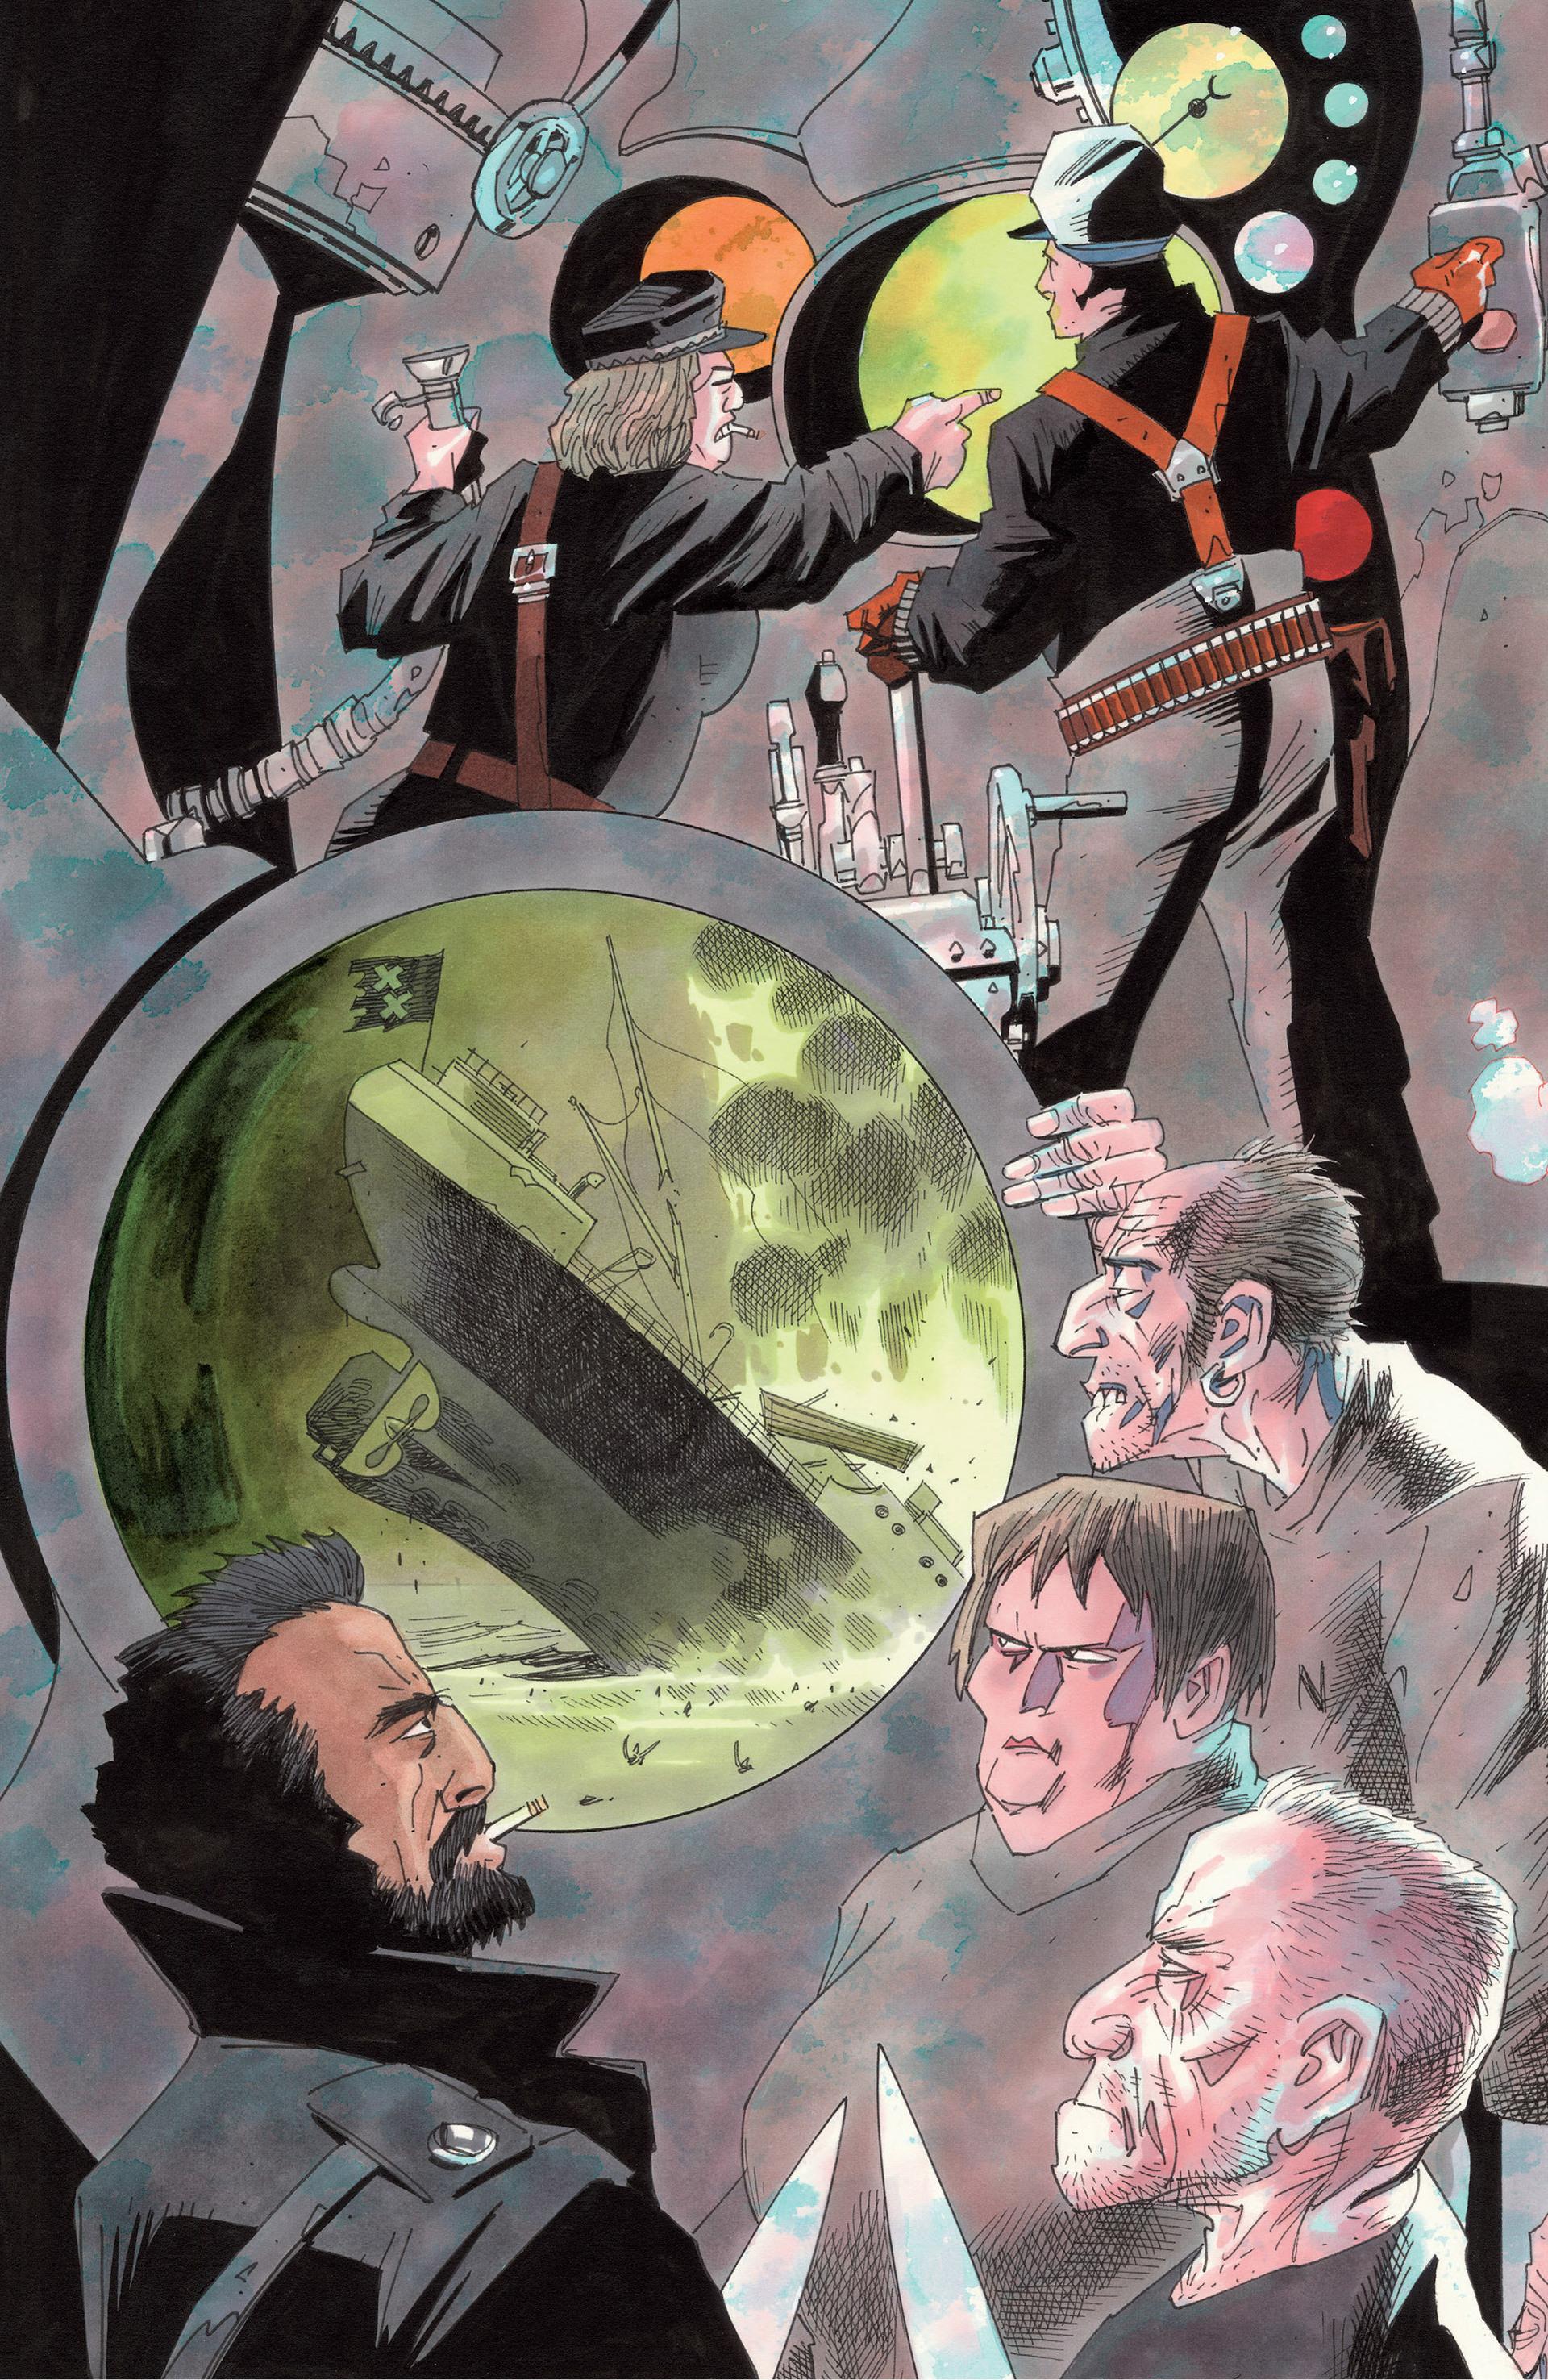 Read online Nemo: Heart of Ice comic -  Issue # Full - 2